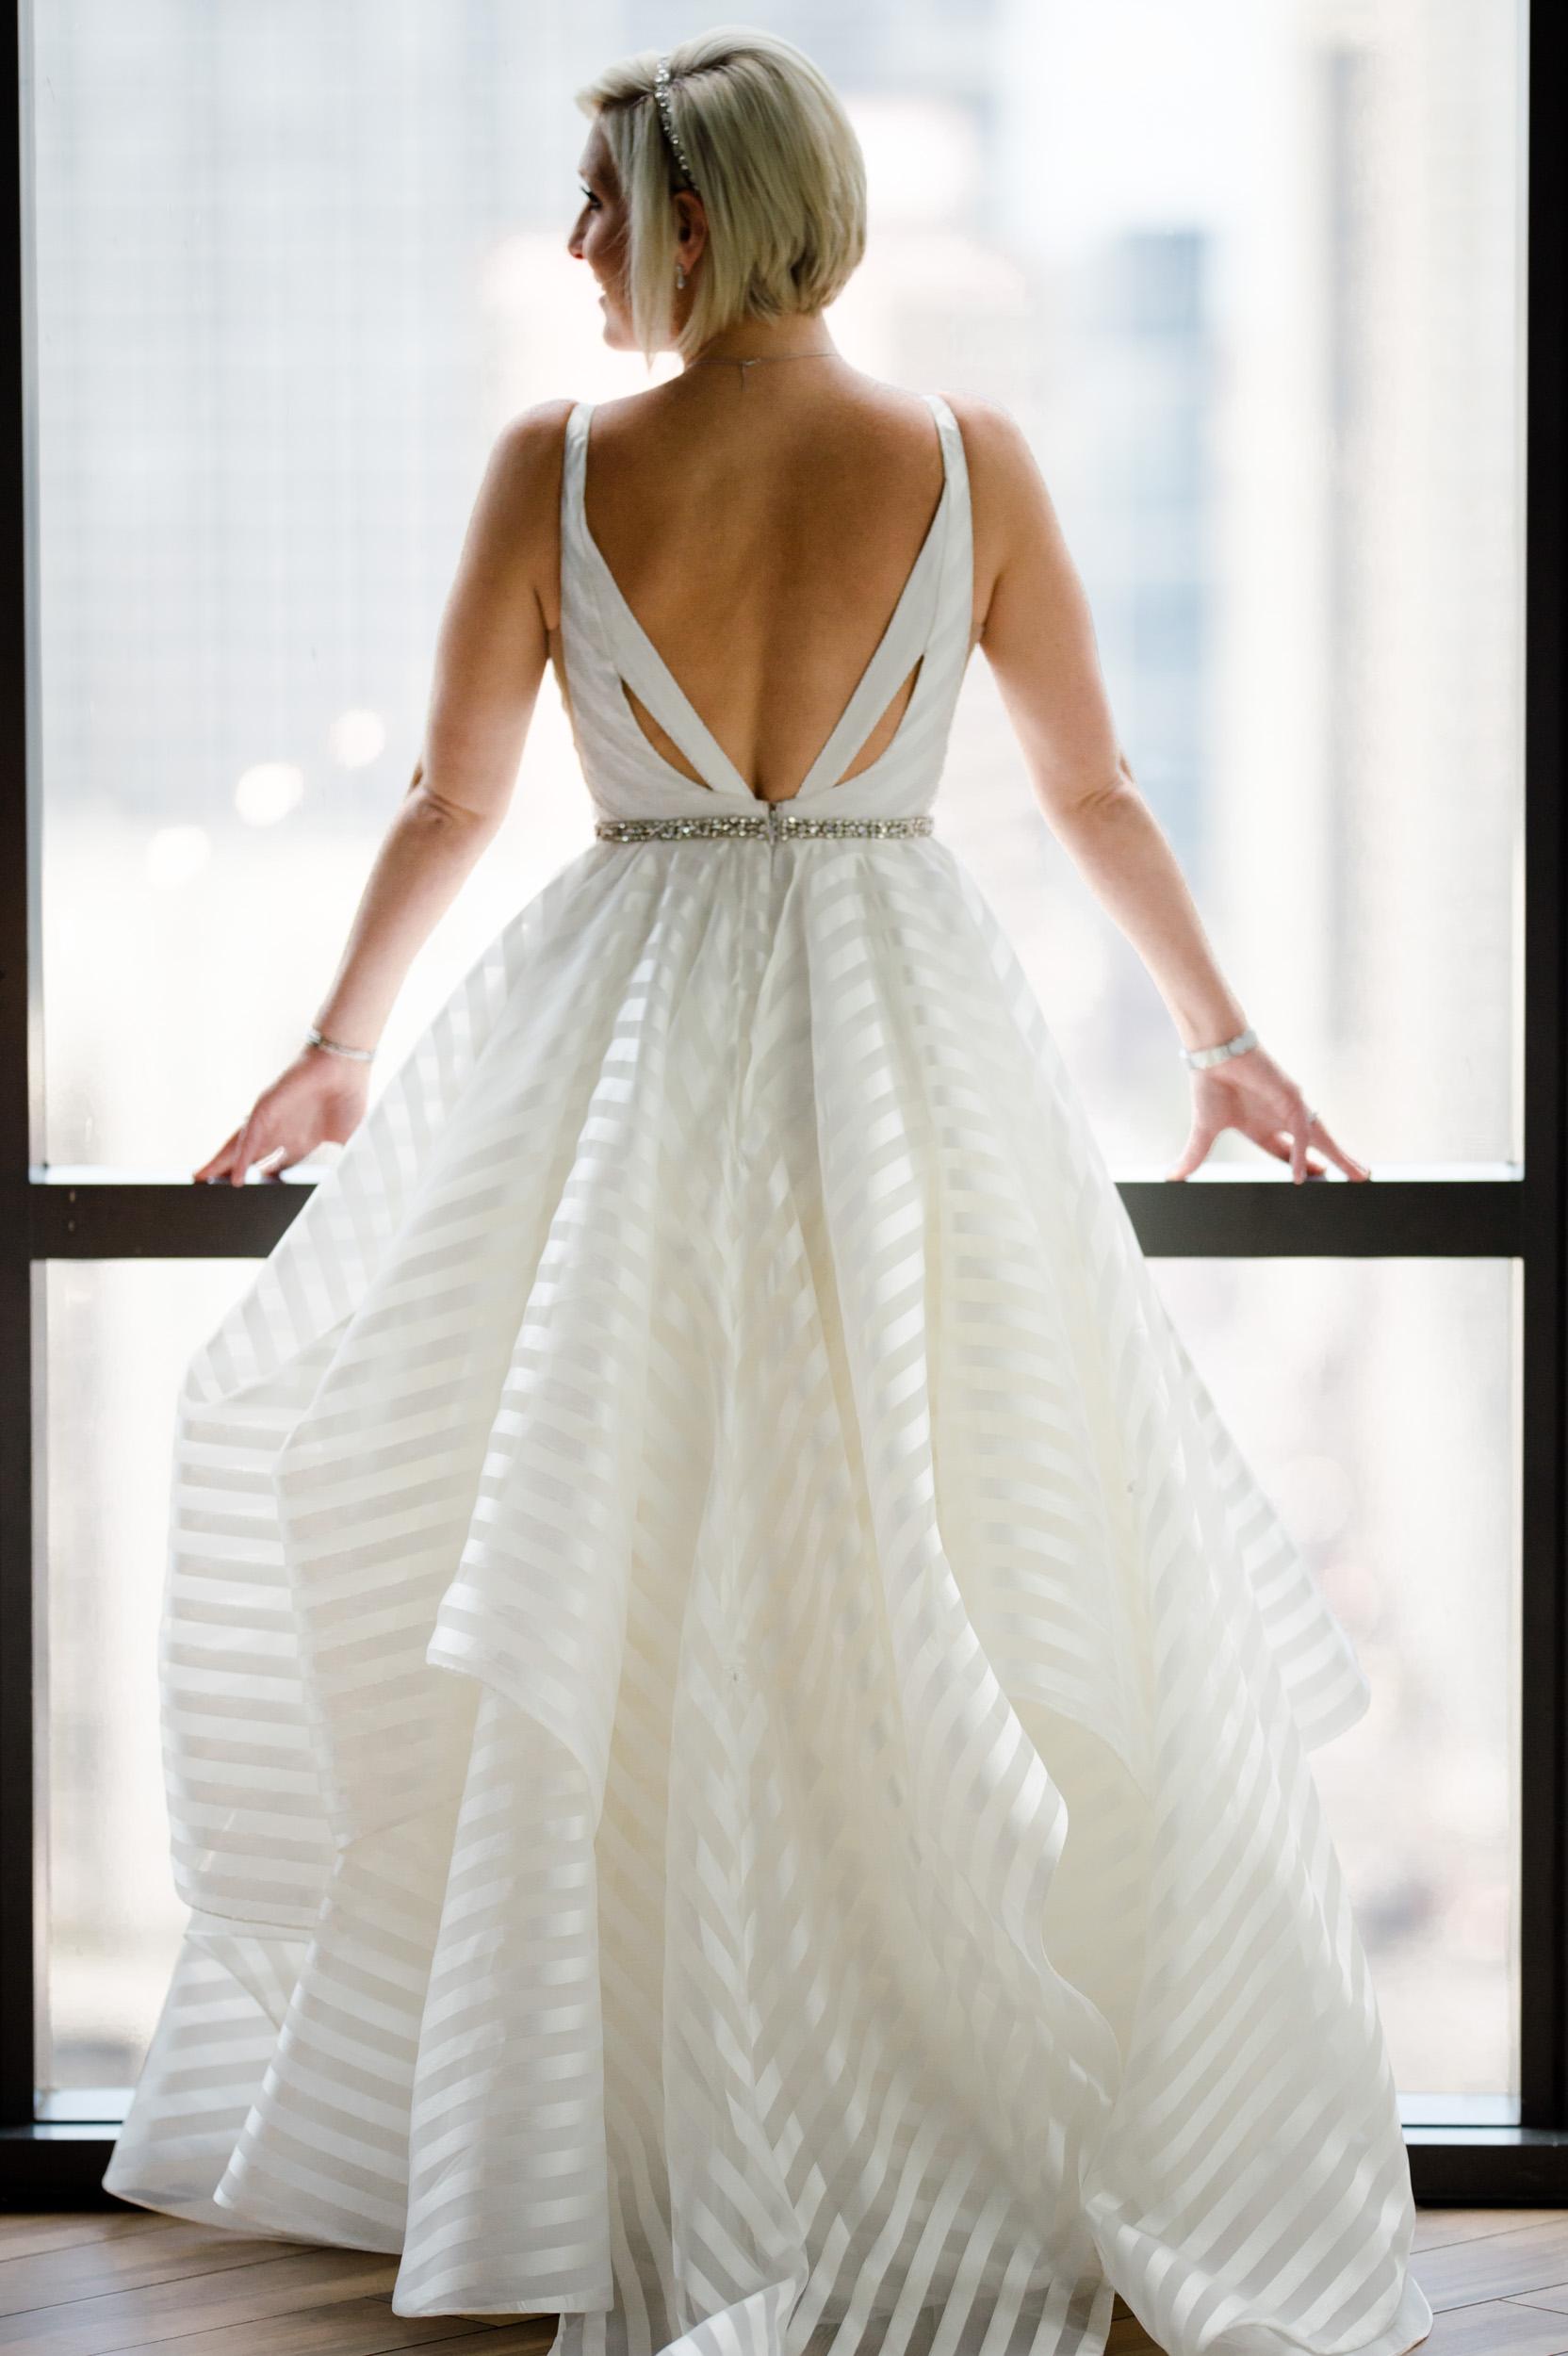 Bridal portrait at the Dana Hotel